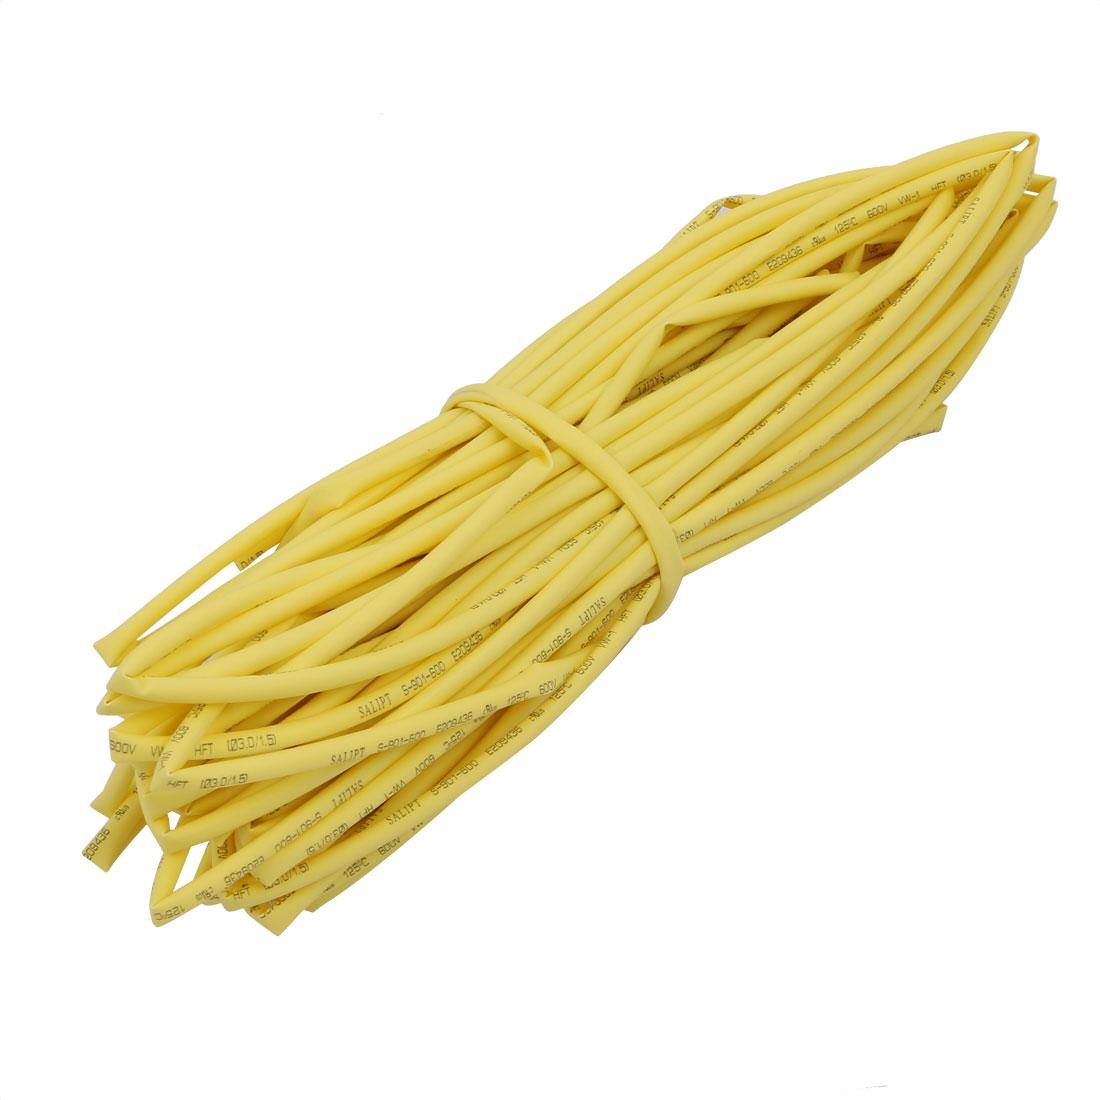 20M 0.12in Inner Dia Polyolefin Flame Retardant Tube Yellow for Wire Repairing